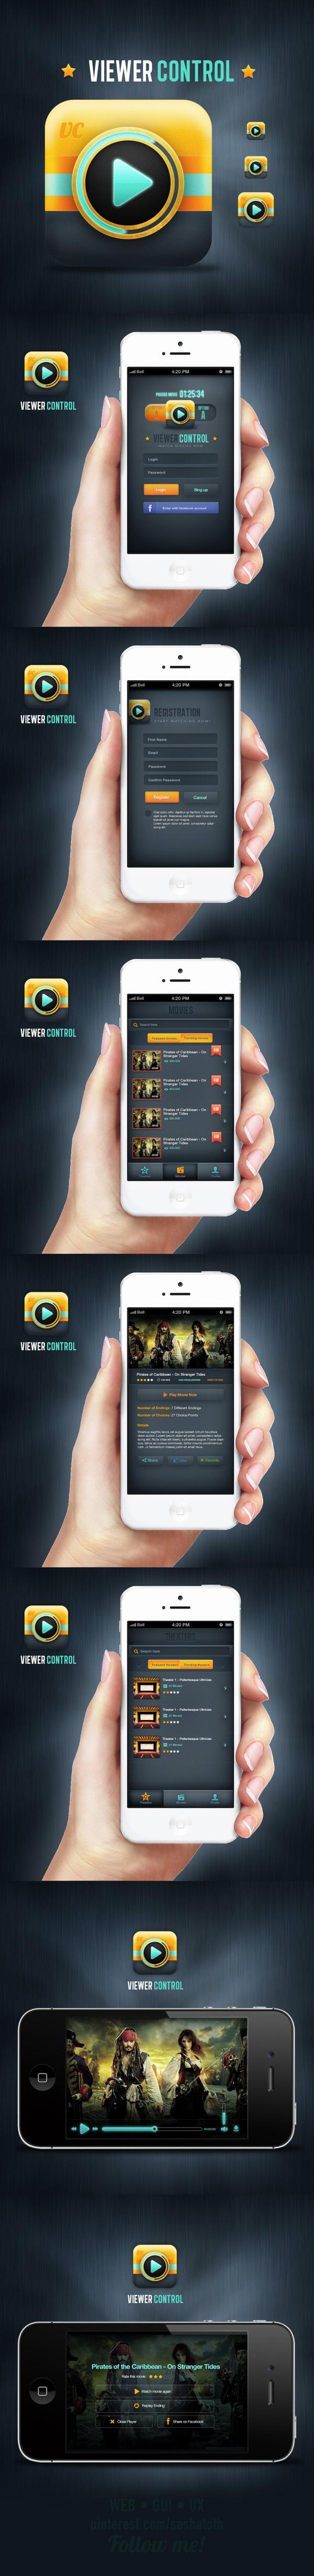 Viewer Control - Mobile app concept by Leonardo Zem, via Behance